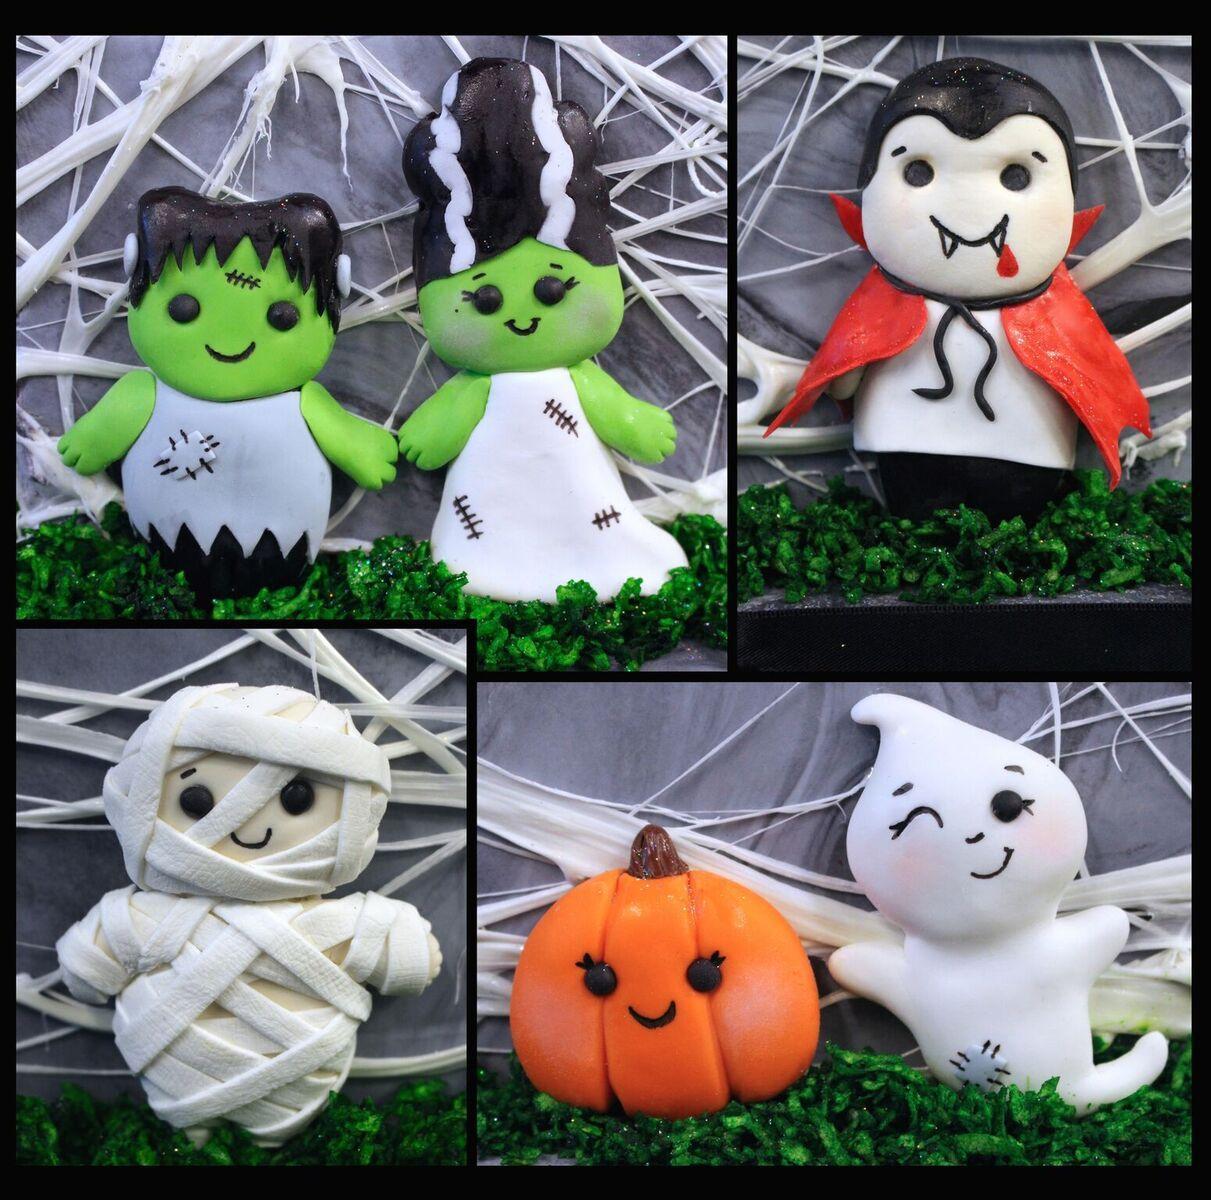 Halloween fondant figures